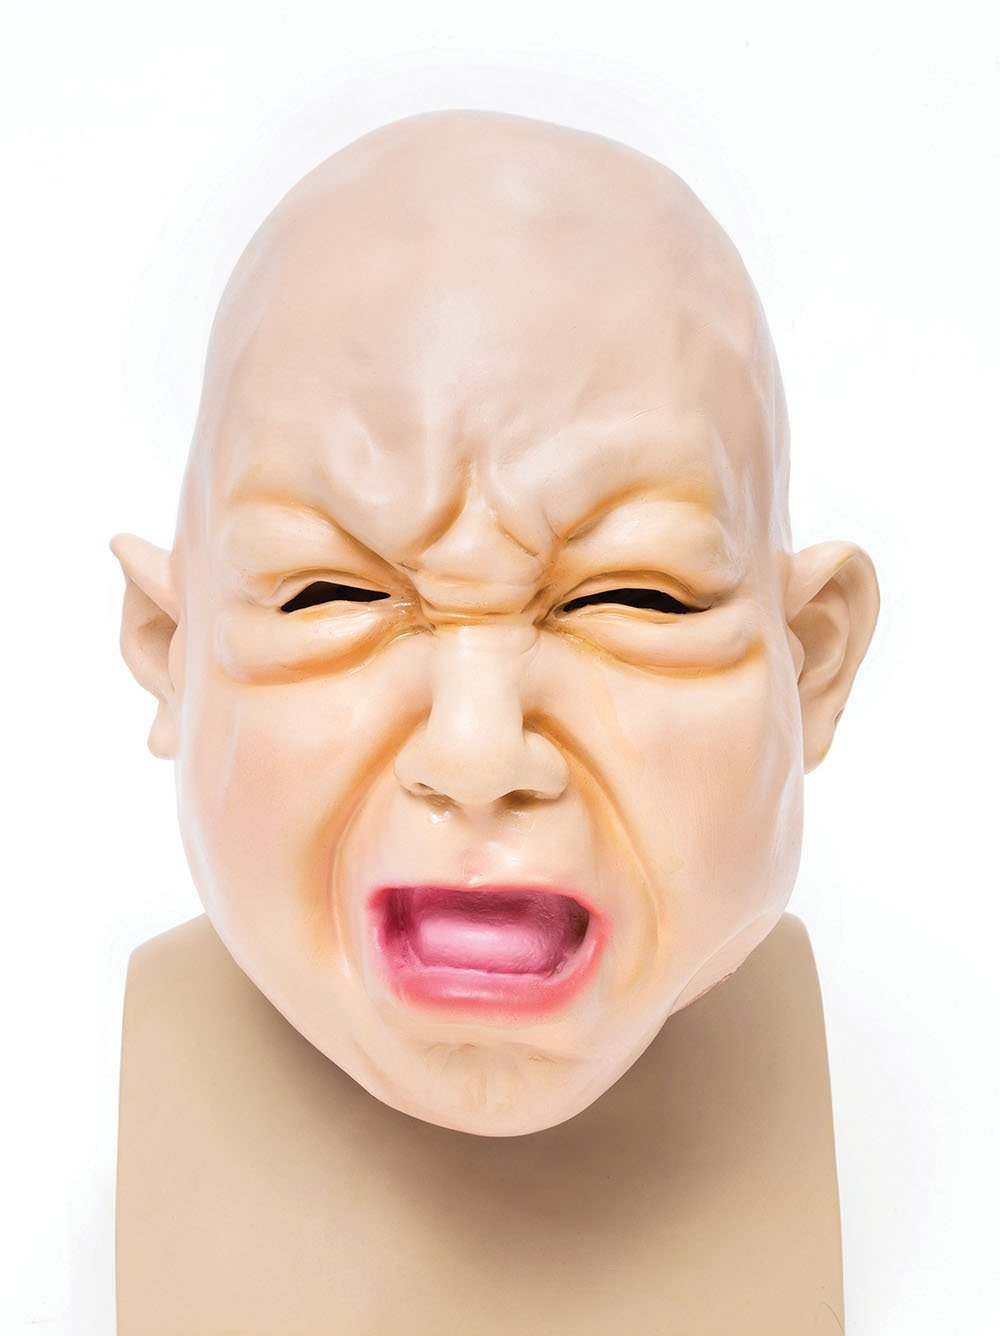 Crying Baby Mask Halloween Cosplay Creepy Cry Baby Adults Overhead ...